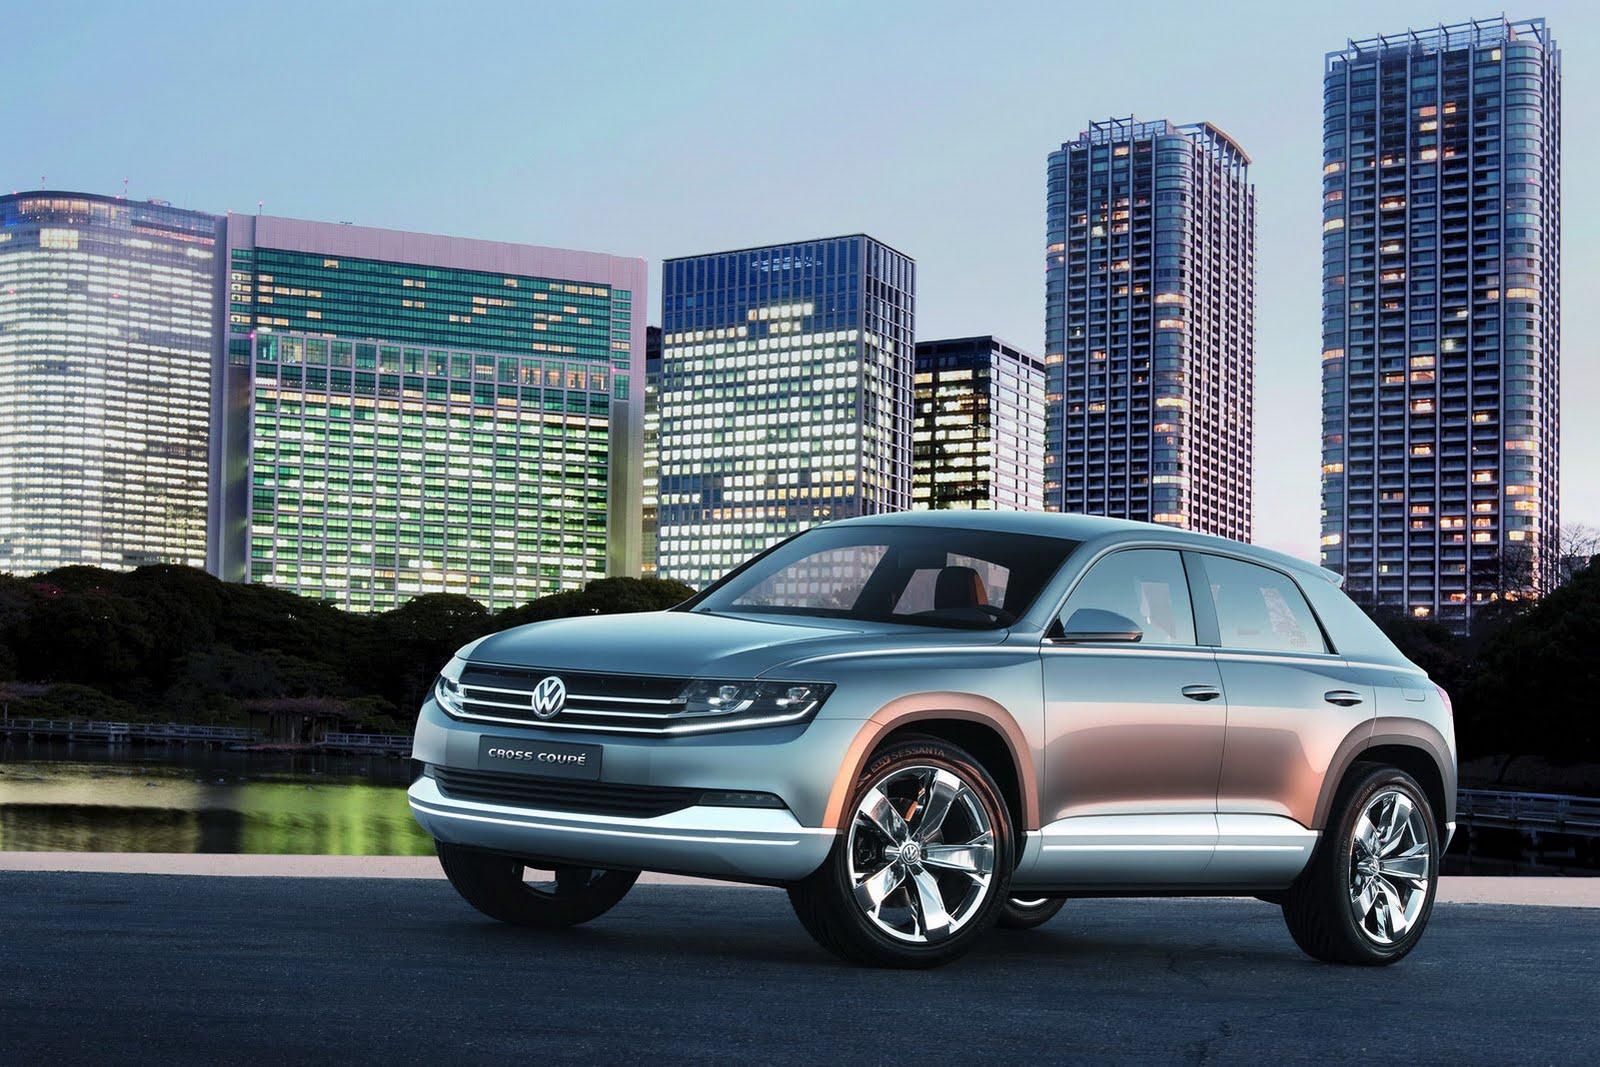 New Volkswagen Cross Coupe Suv Concept